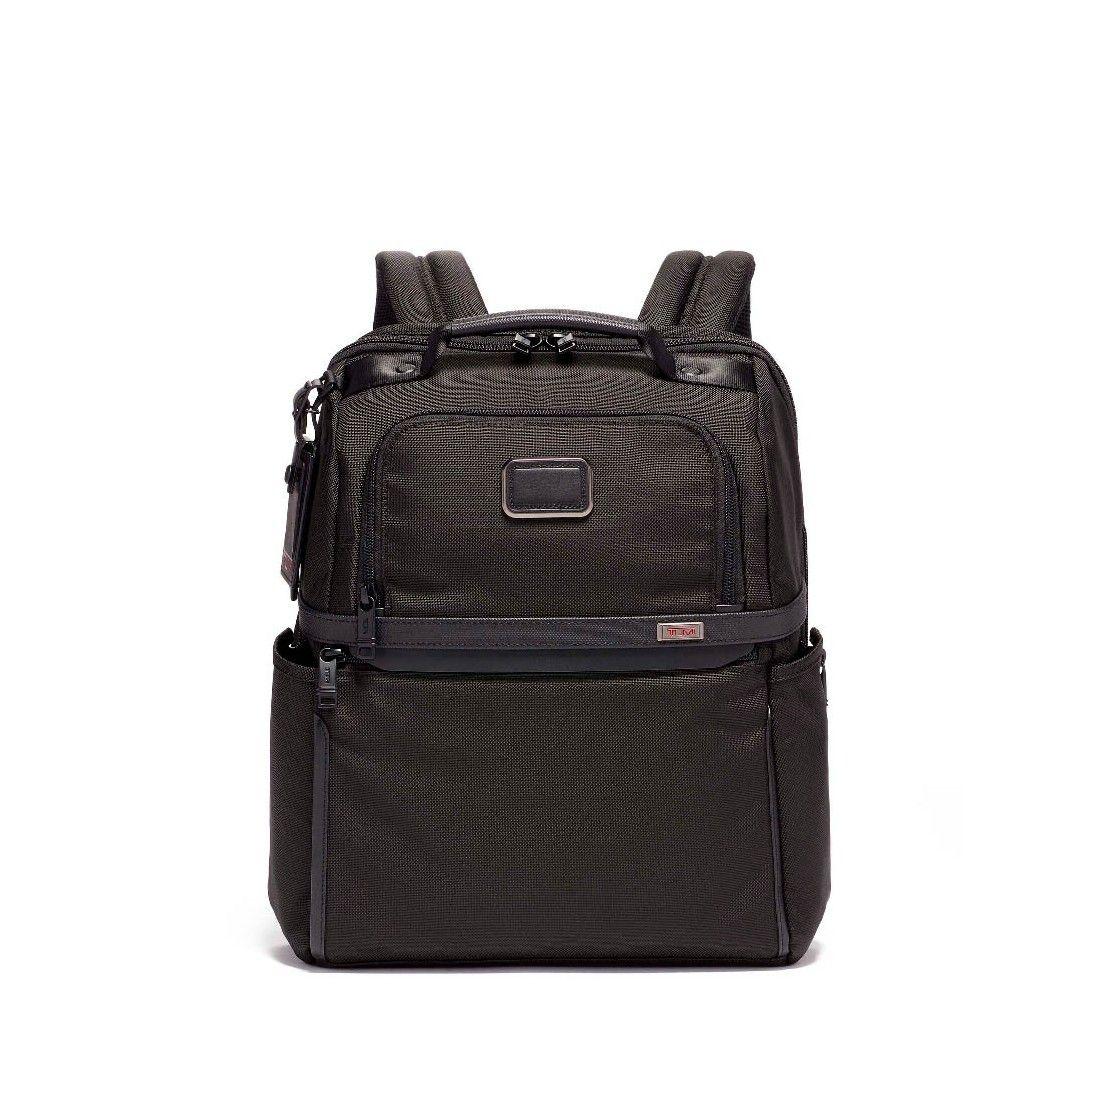 Mochila Slim Solutions Briefpack - Tumi - 1